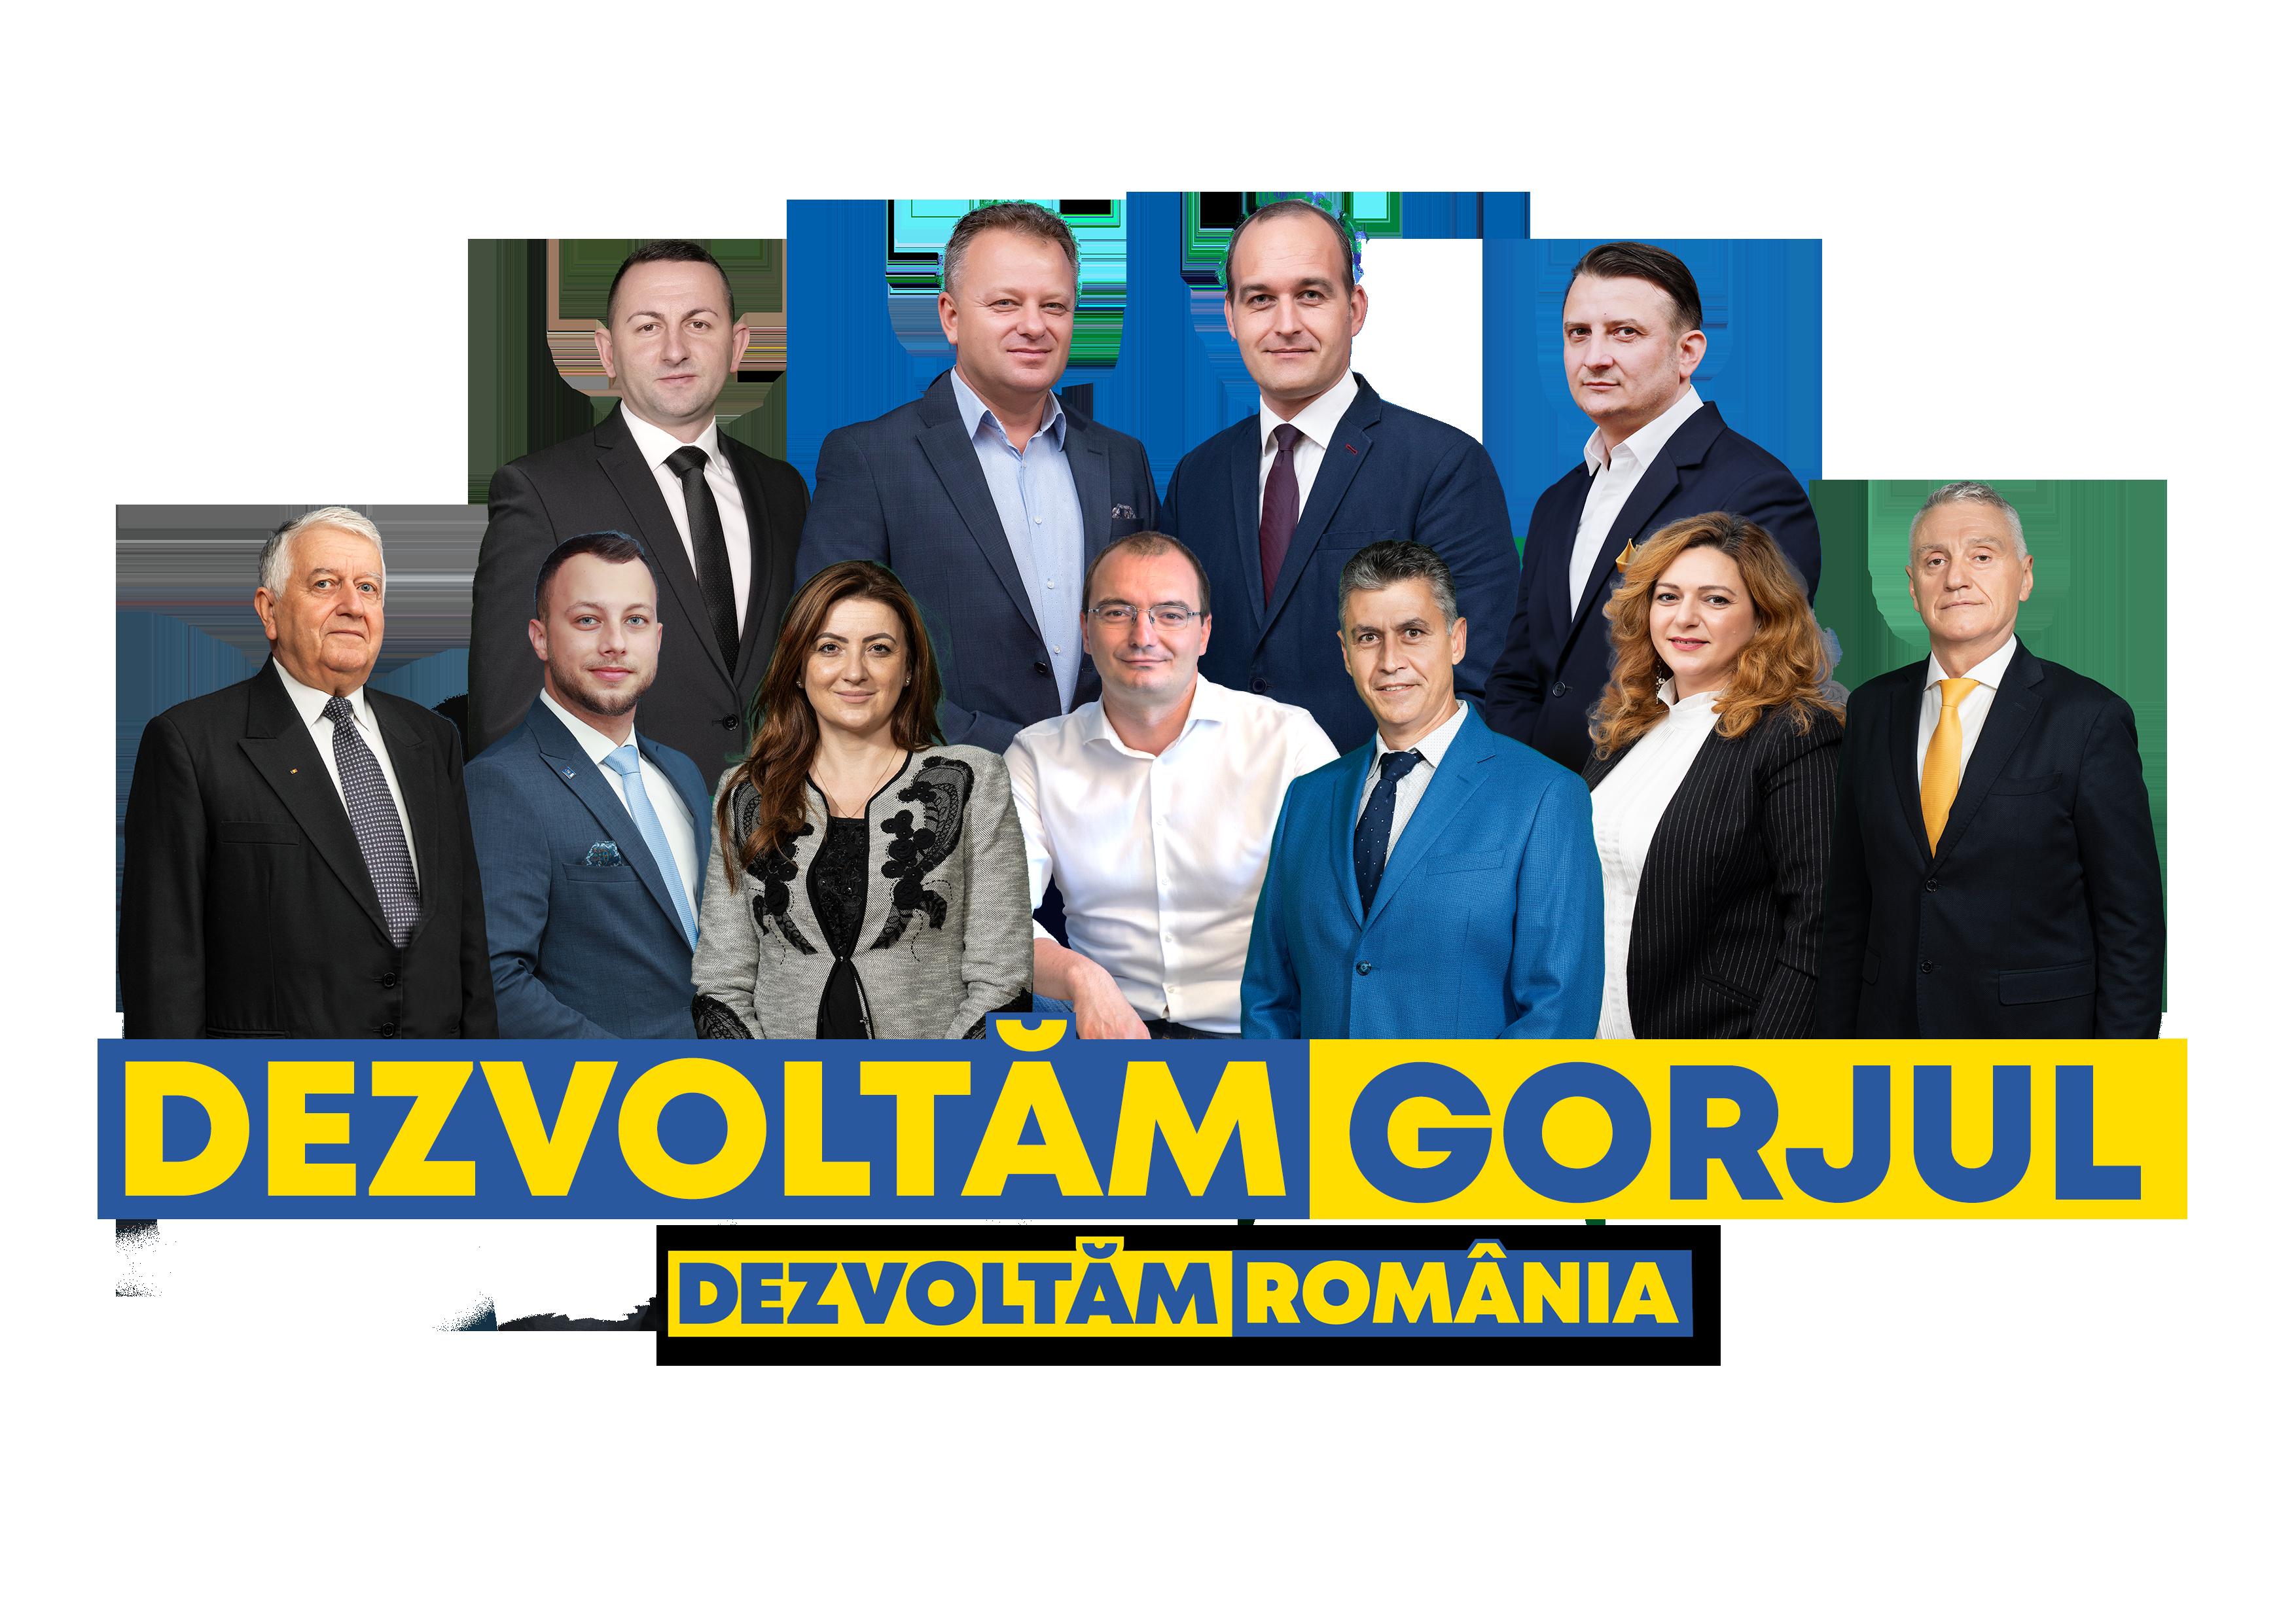 https://imipasadegorj.ro/wp-content/uploads/2020/11/Echipa.png